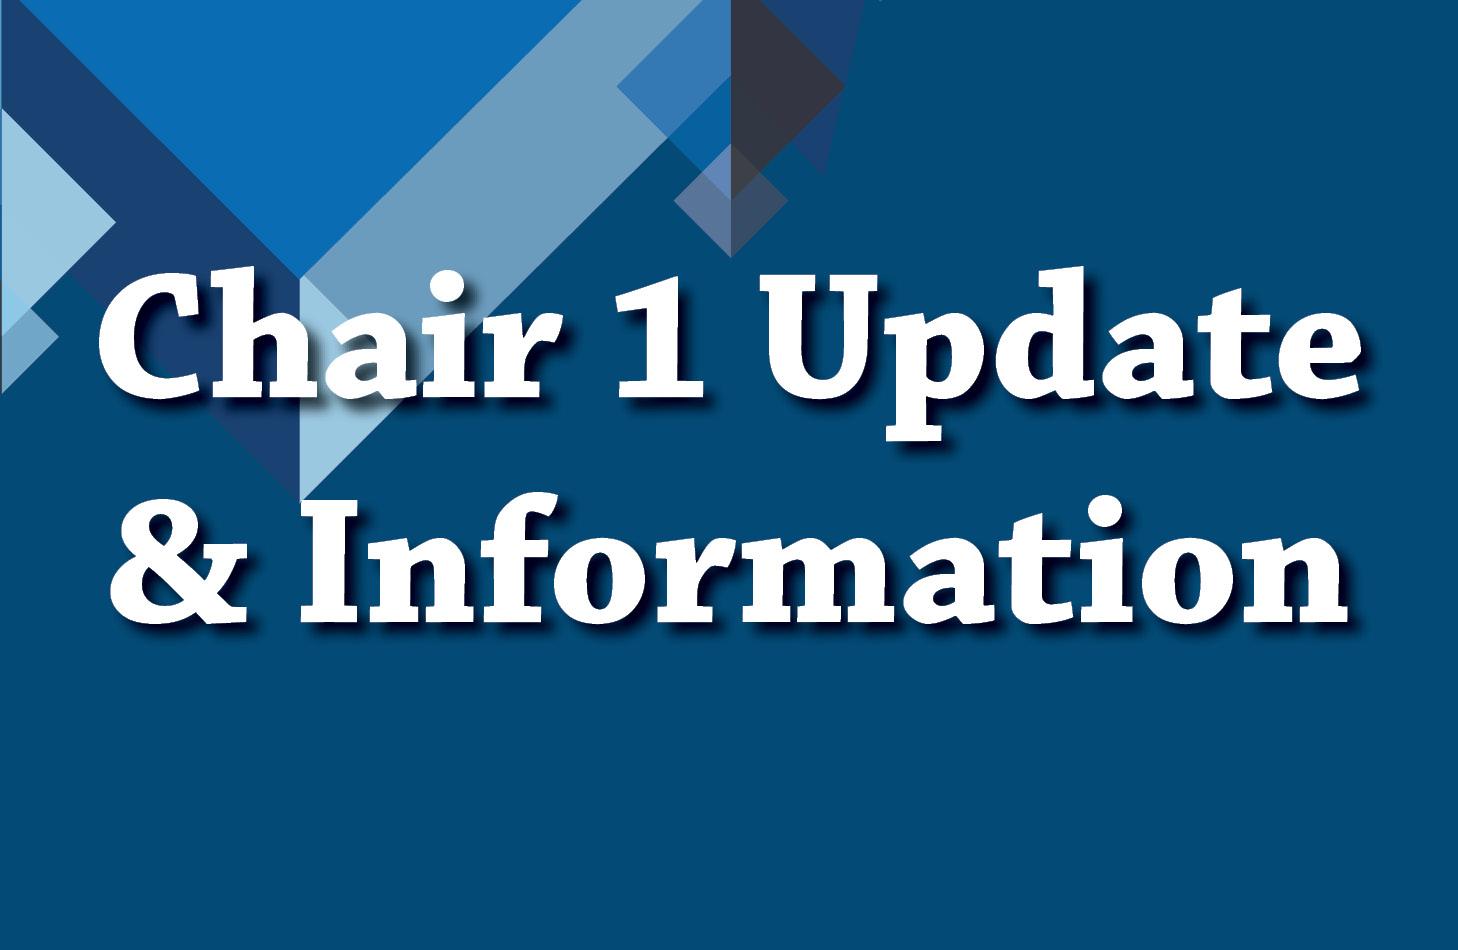 Lift Operations Update